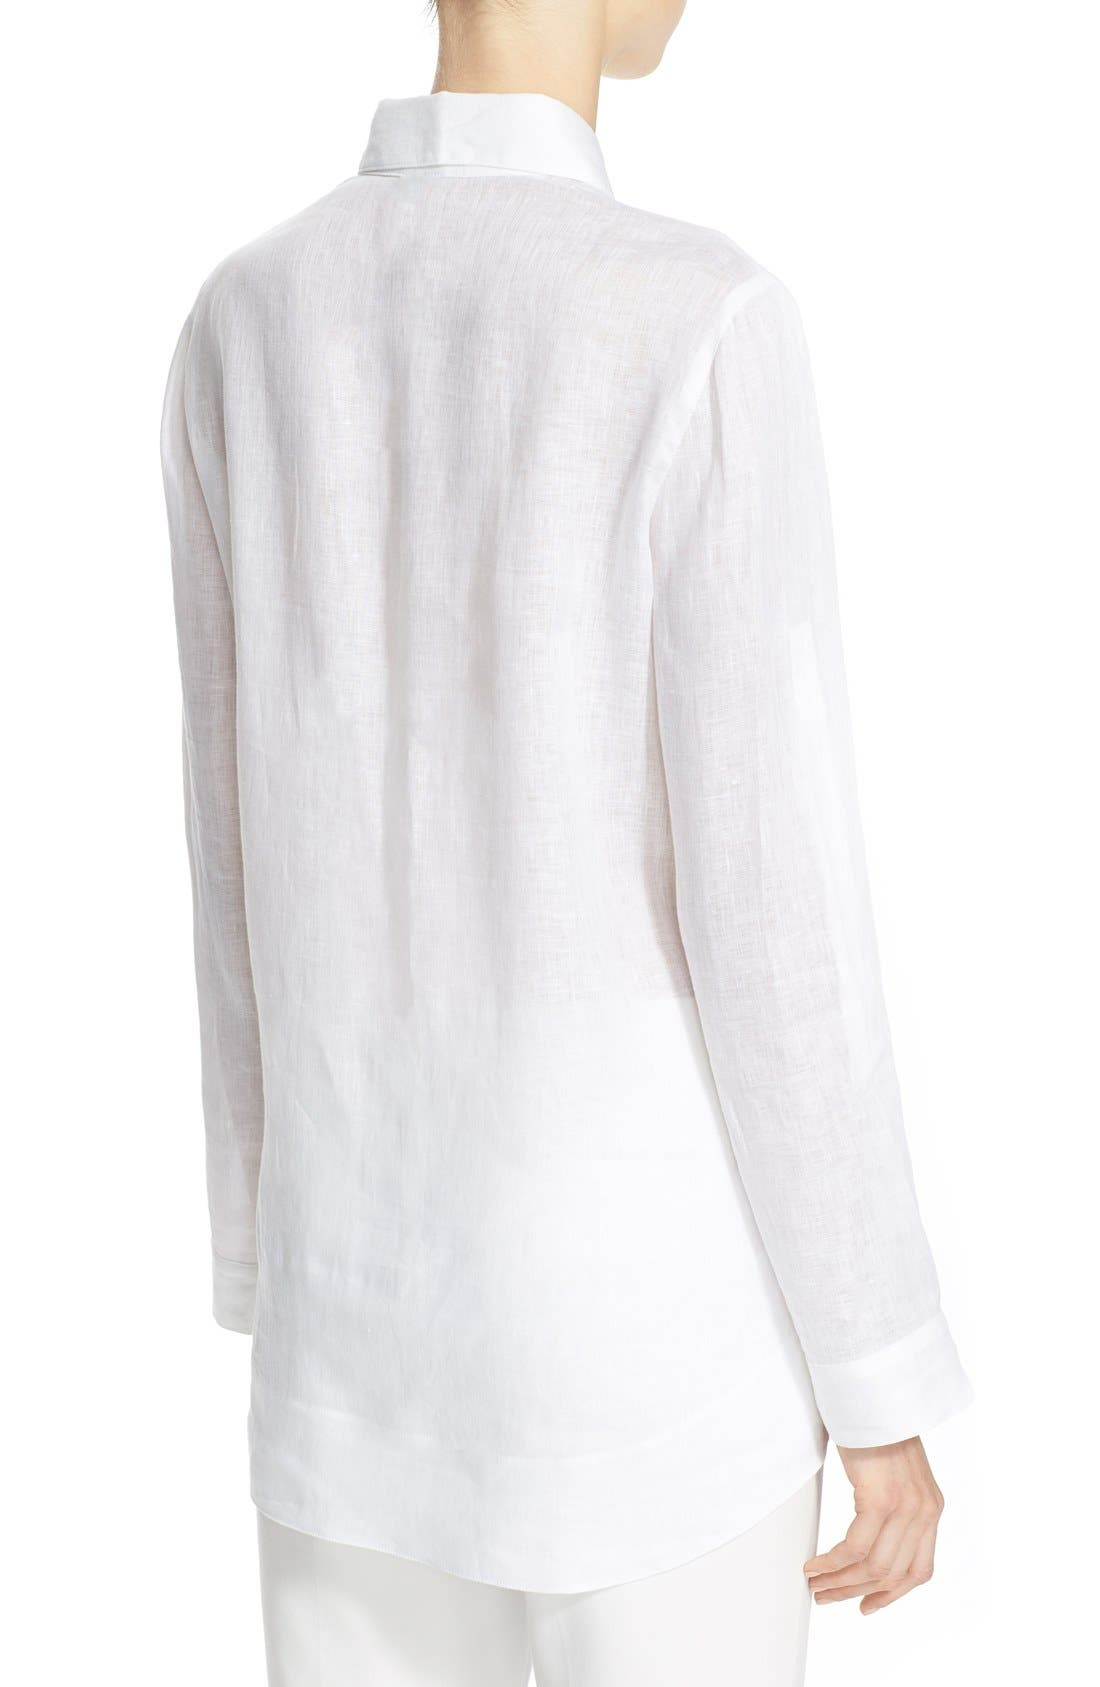 ARMANI COLLEZIONI,                             Linen Tuxedo Shirt,                             Alternate thumbnail 6, color,                             100